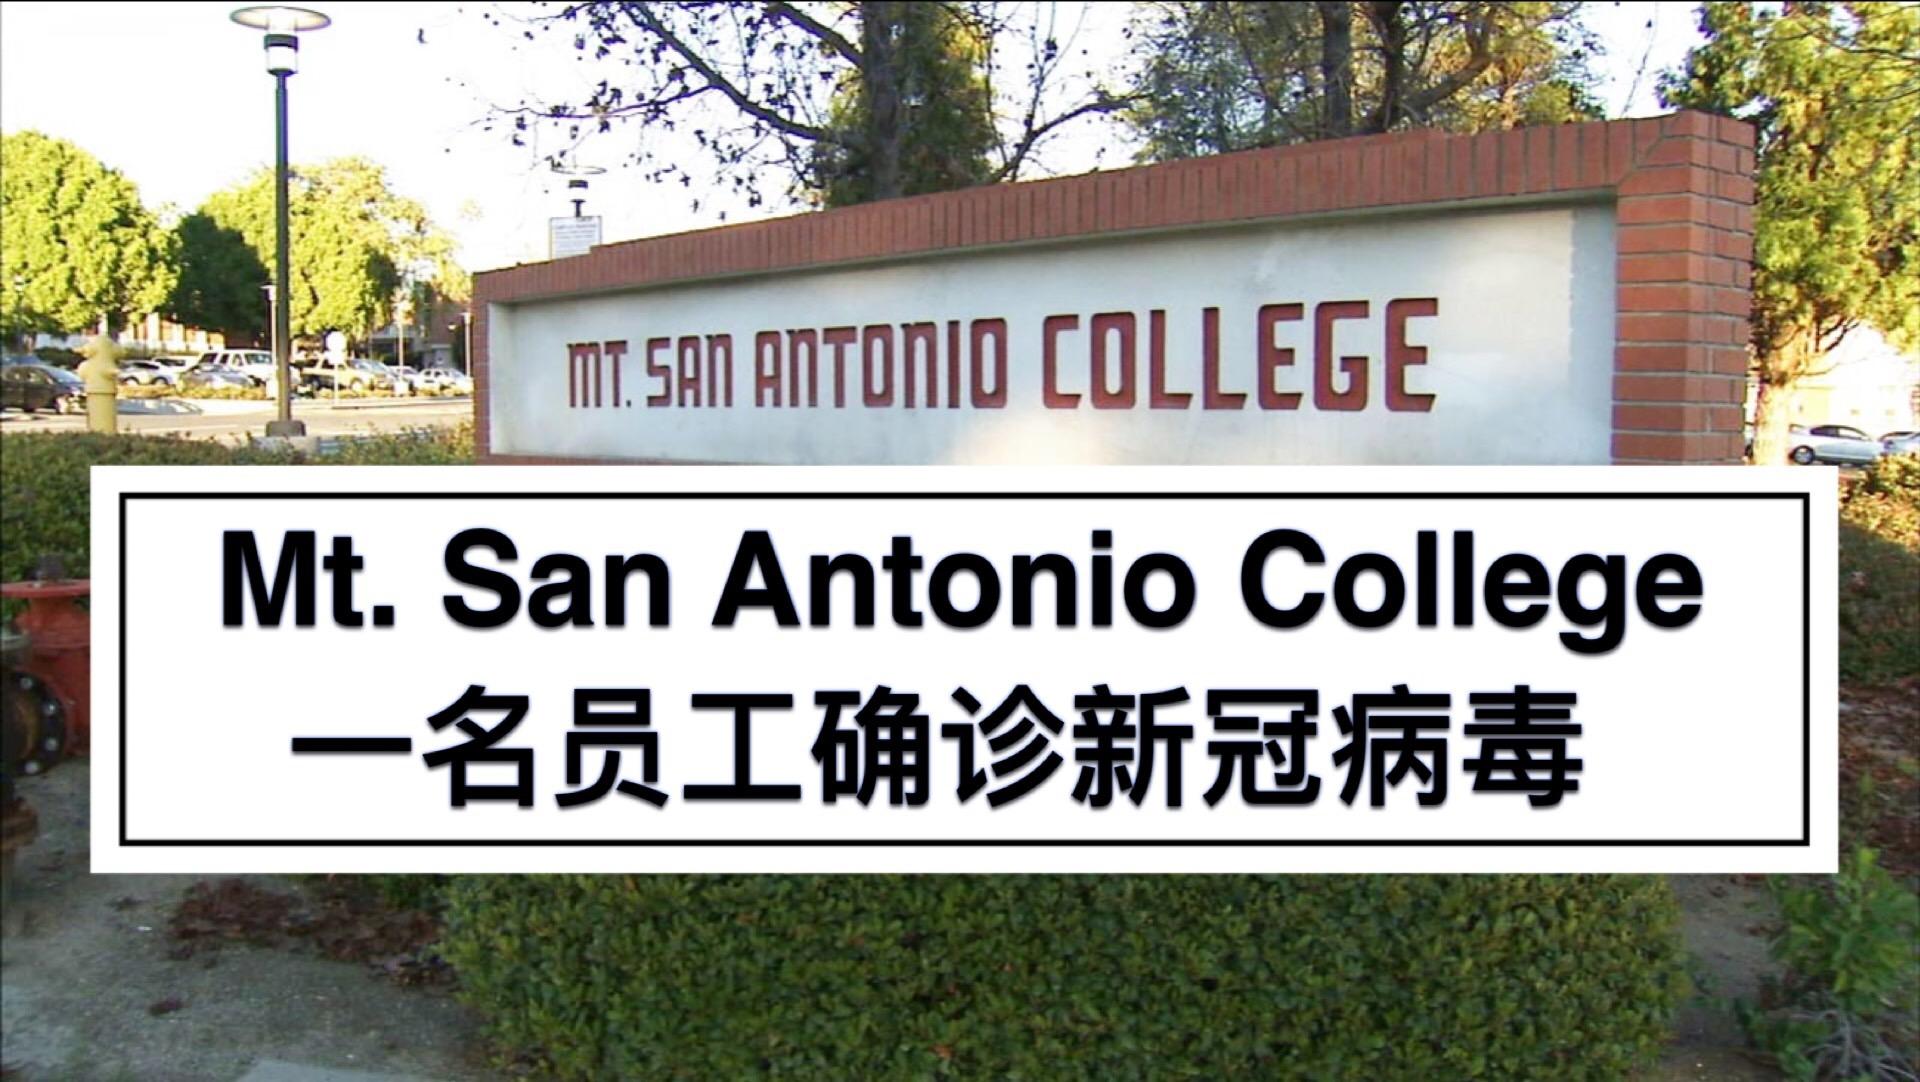 Mt. San Antonio College一名员工确诊新冠病毒